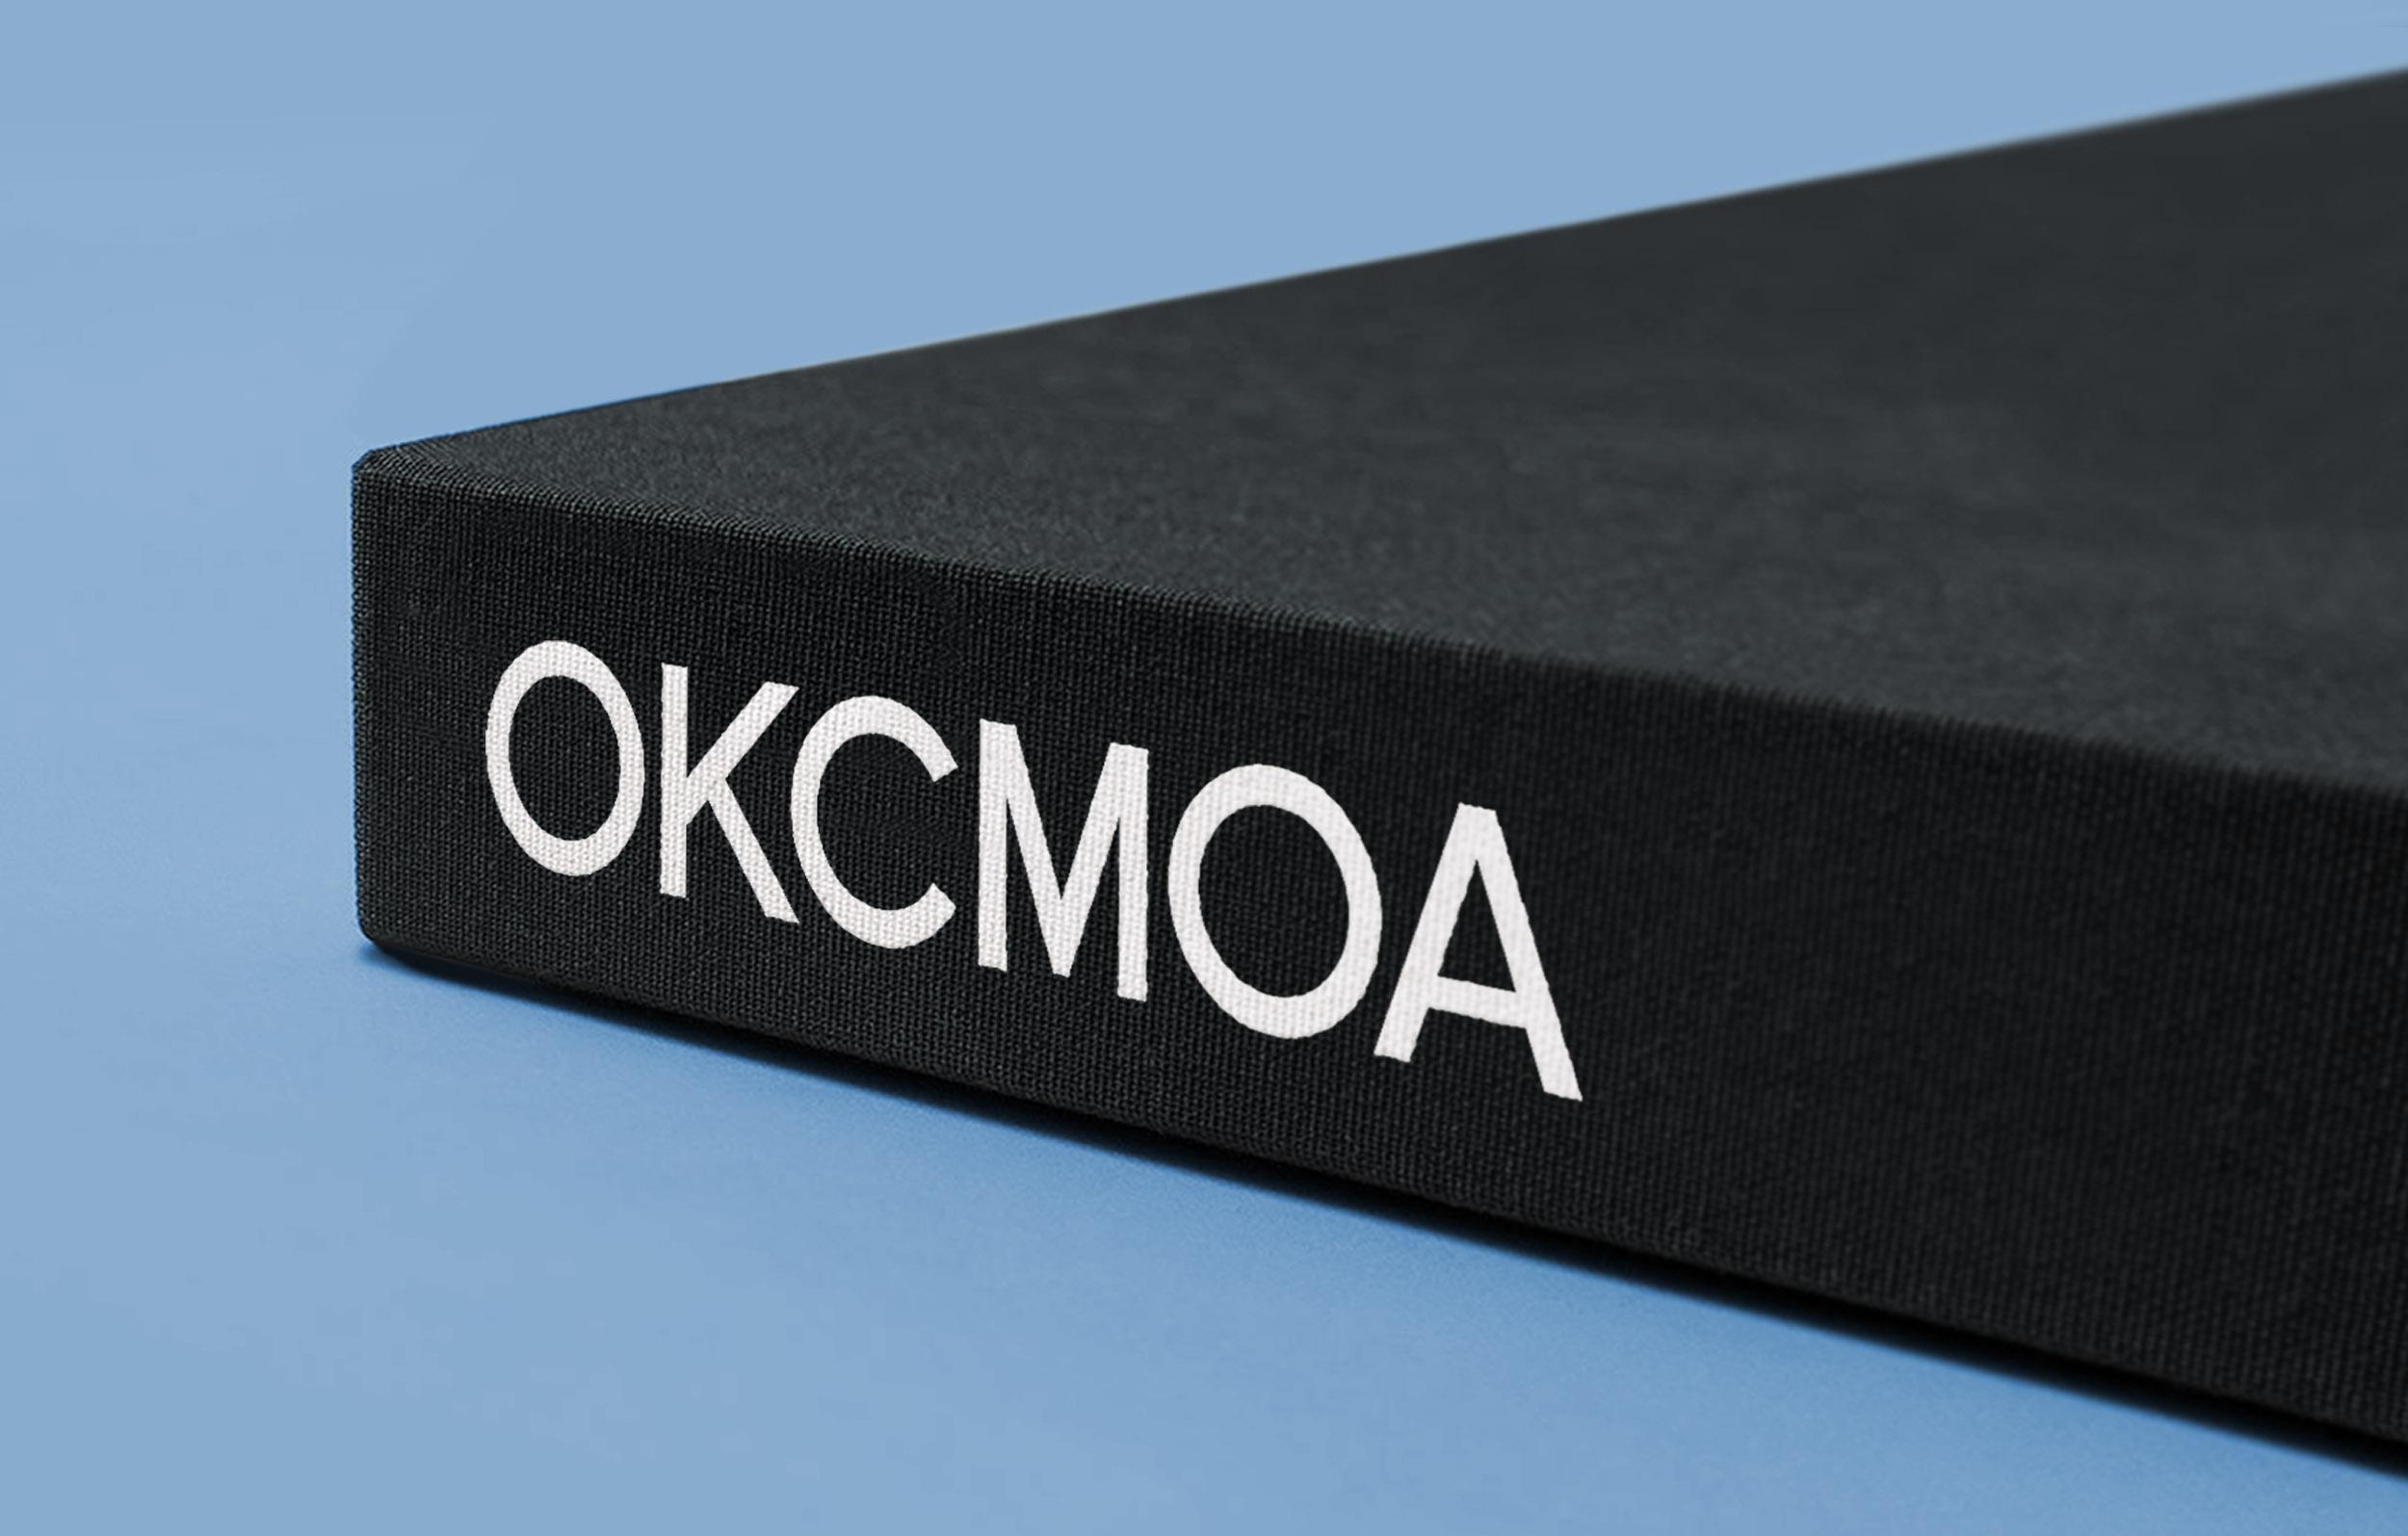 OKCMOA GuideCorner